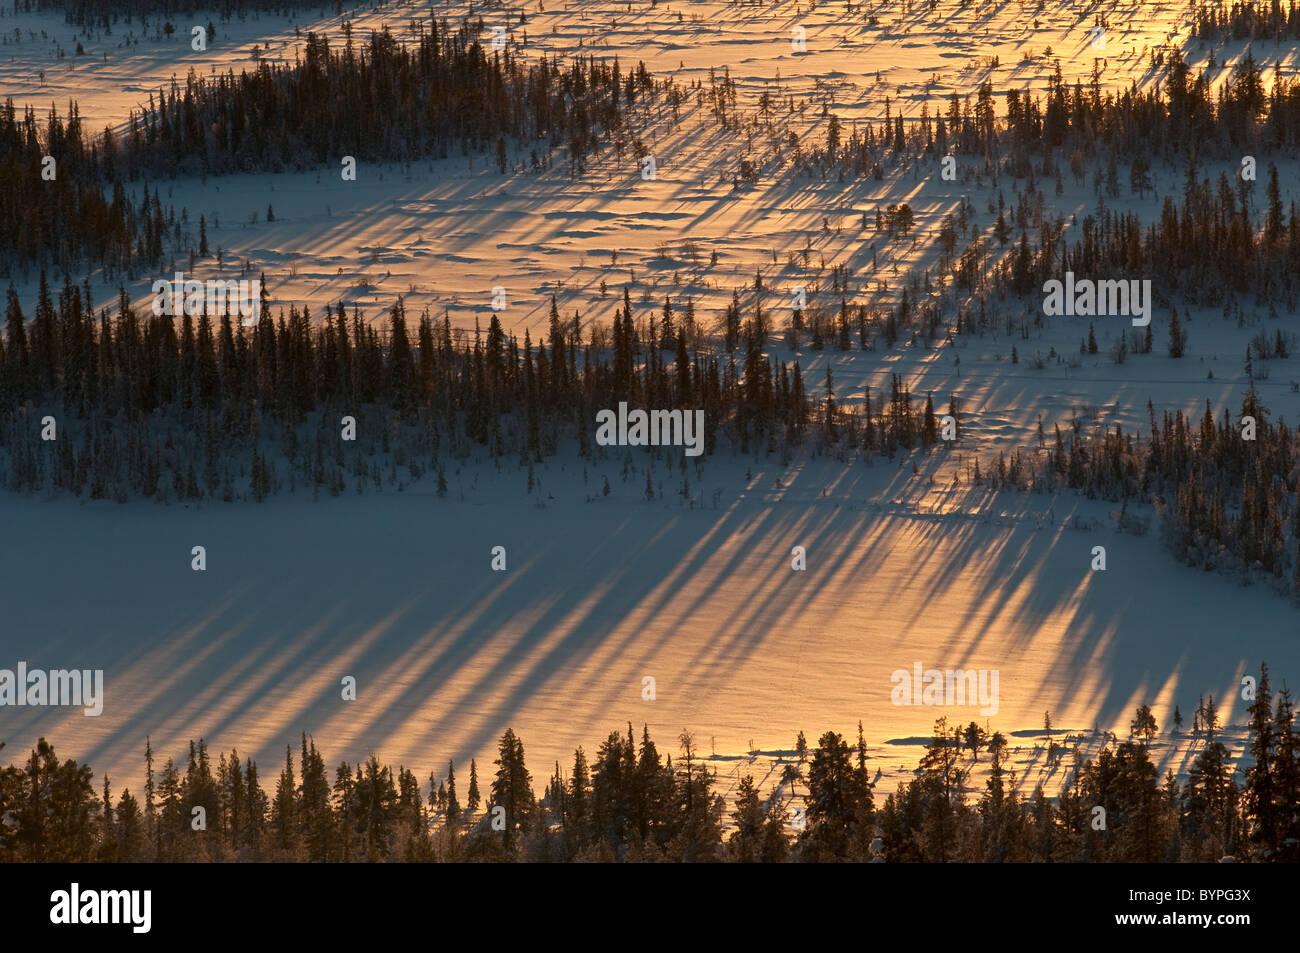 Baeume mit Schattenwurf, Sjaunja Naturreservat, Welterbe Laponia, Lappland, Schweden - Stock Image